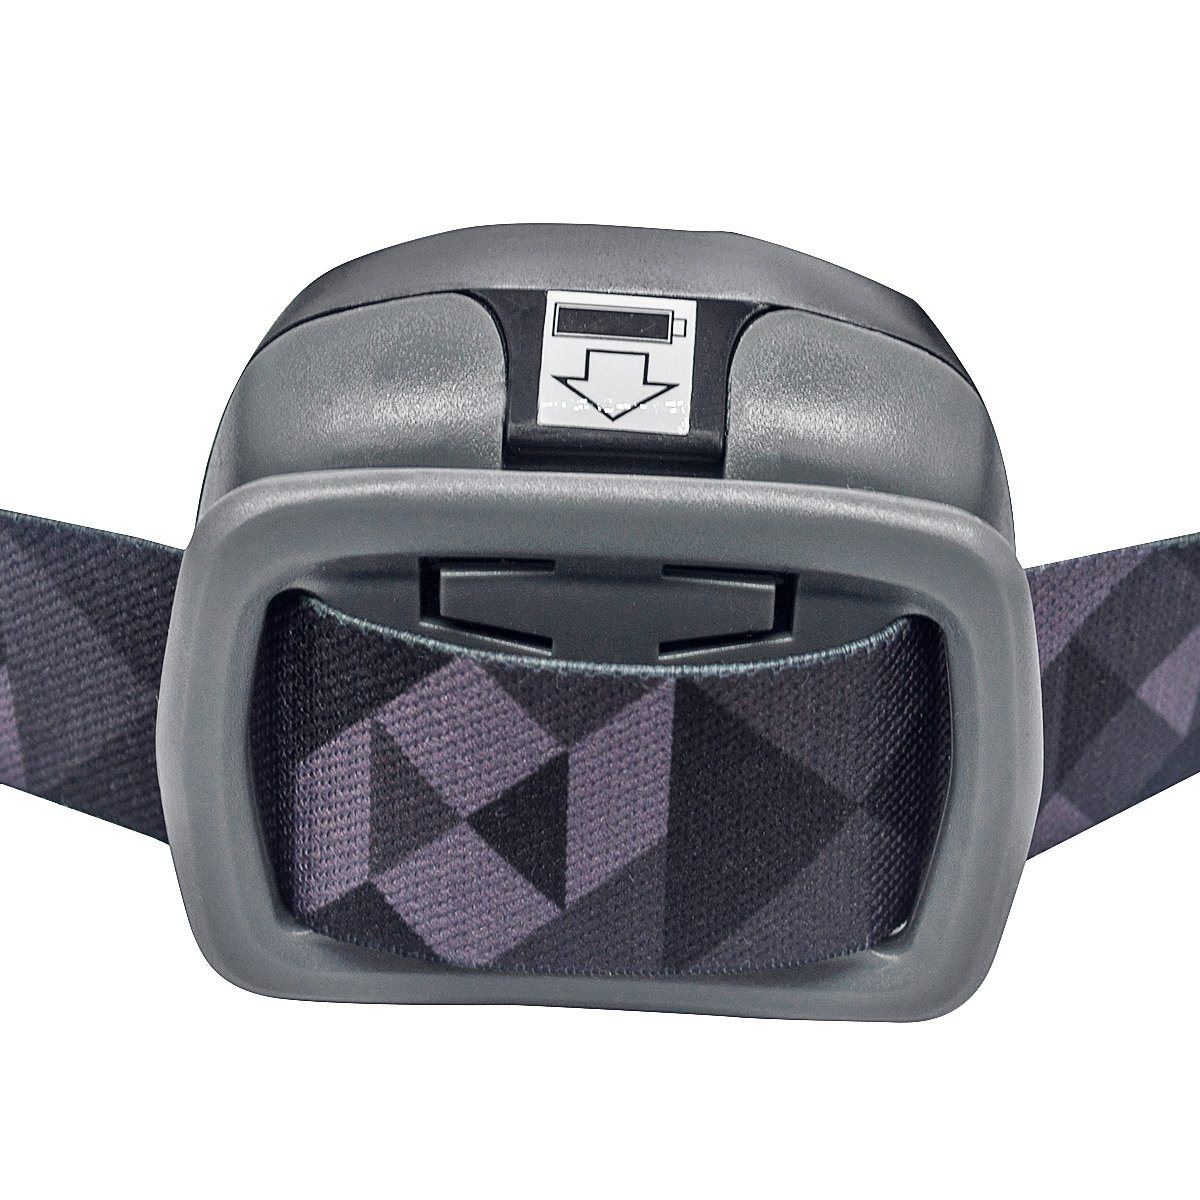 Portable Headlamp, Applied to Climbing, Camping, Hiking, Fishing